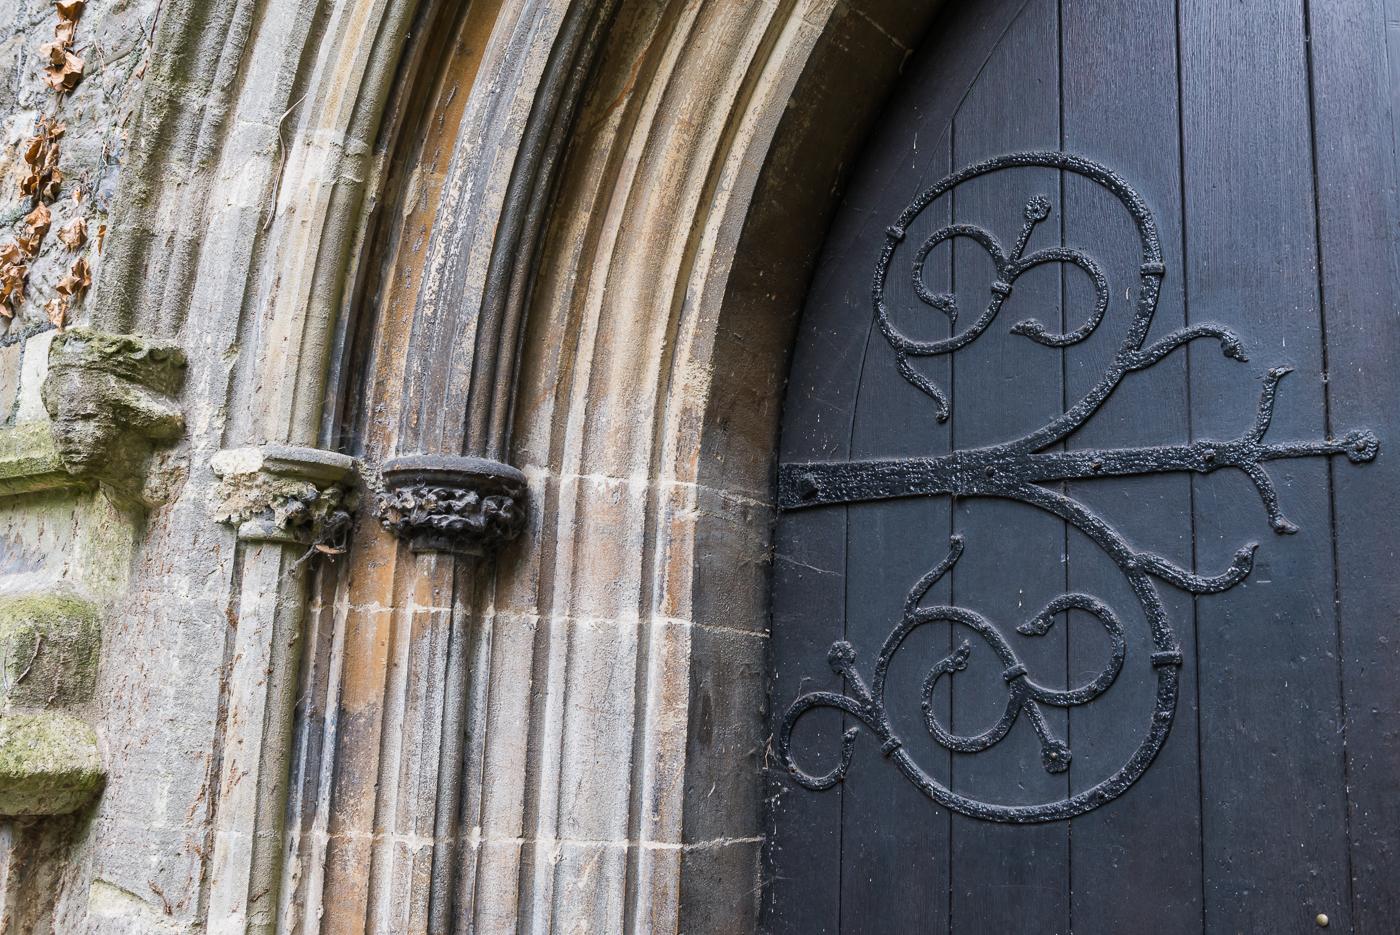 CHURCH DOOR DETAIL by Paul Dubbelman